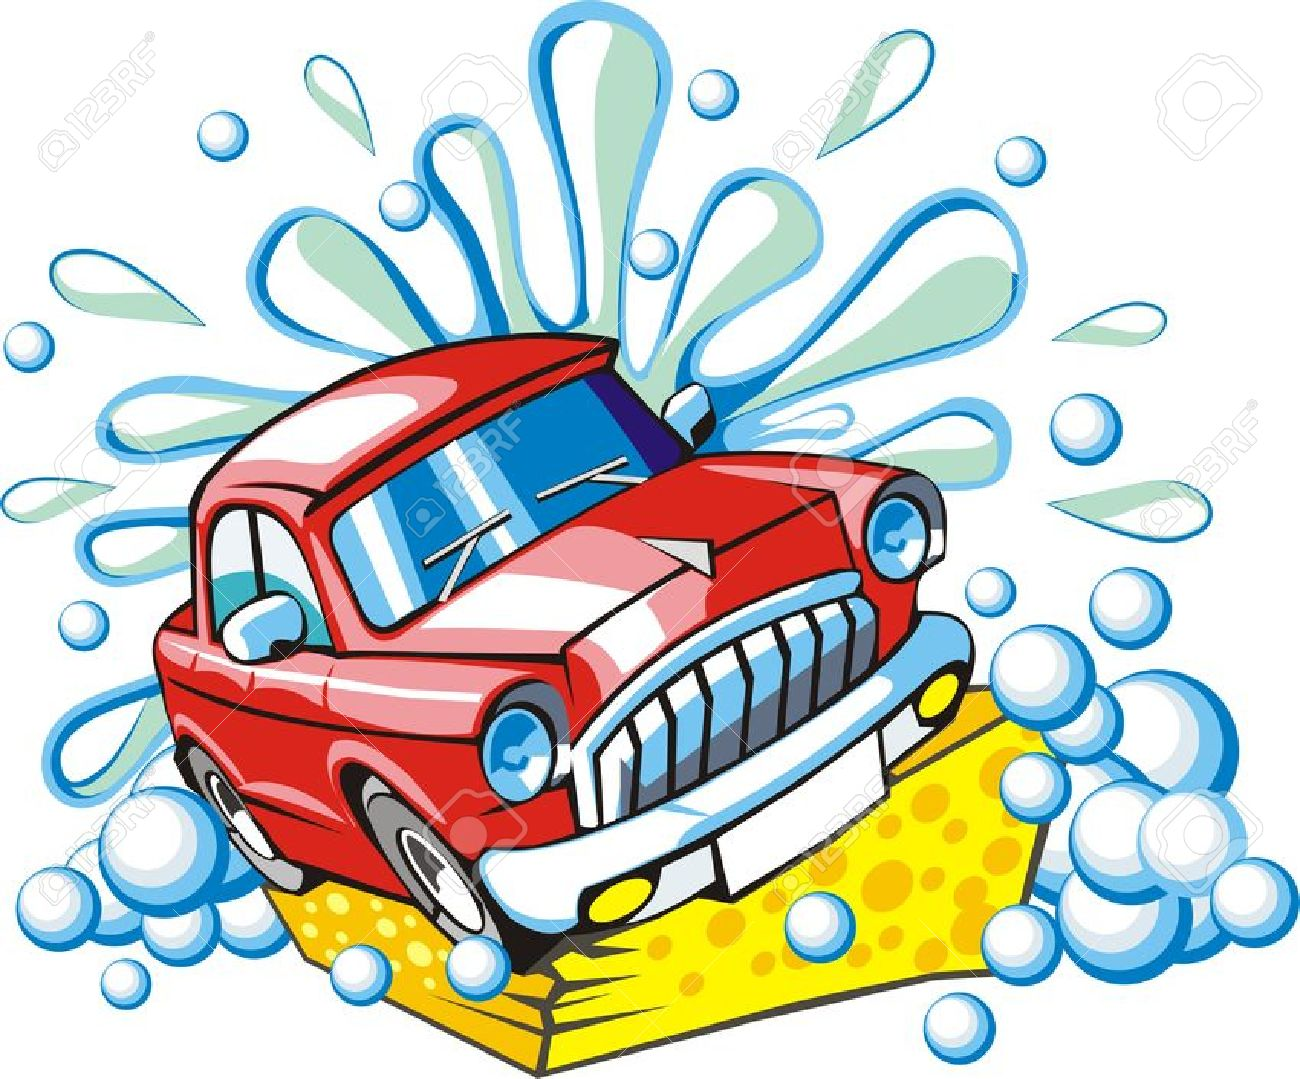 820 Car Wash free clipart.